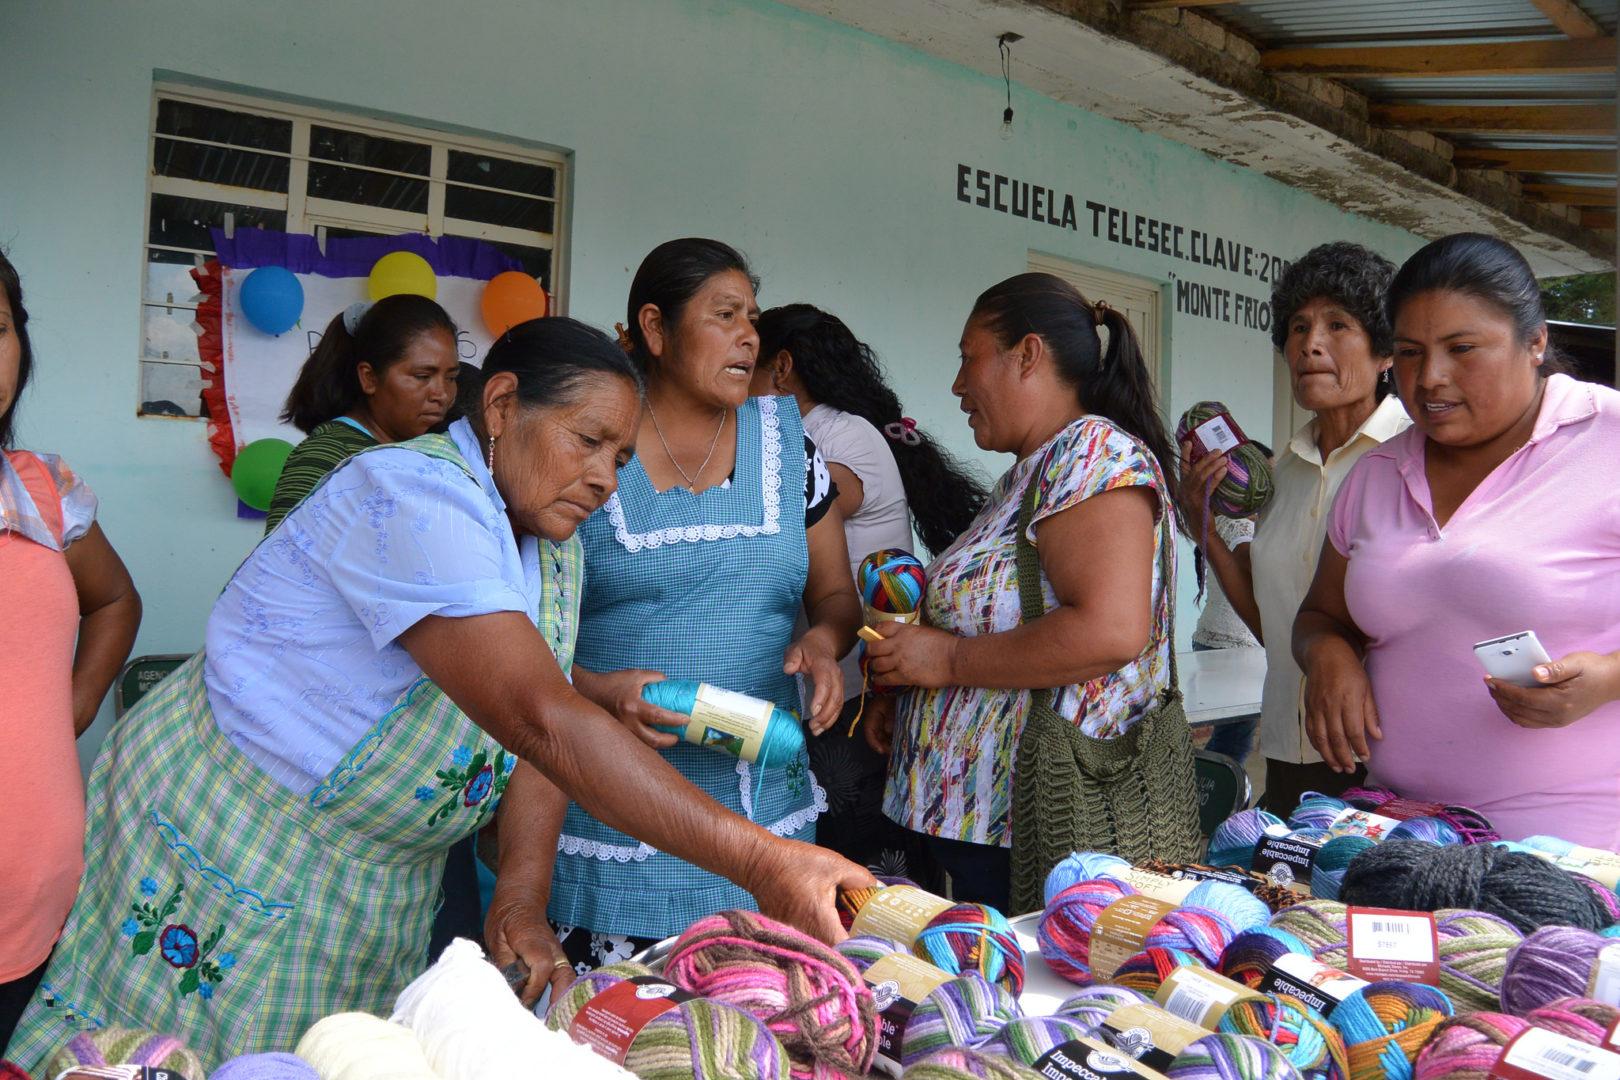 A handicraft market in Mexico